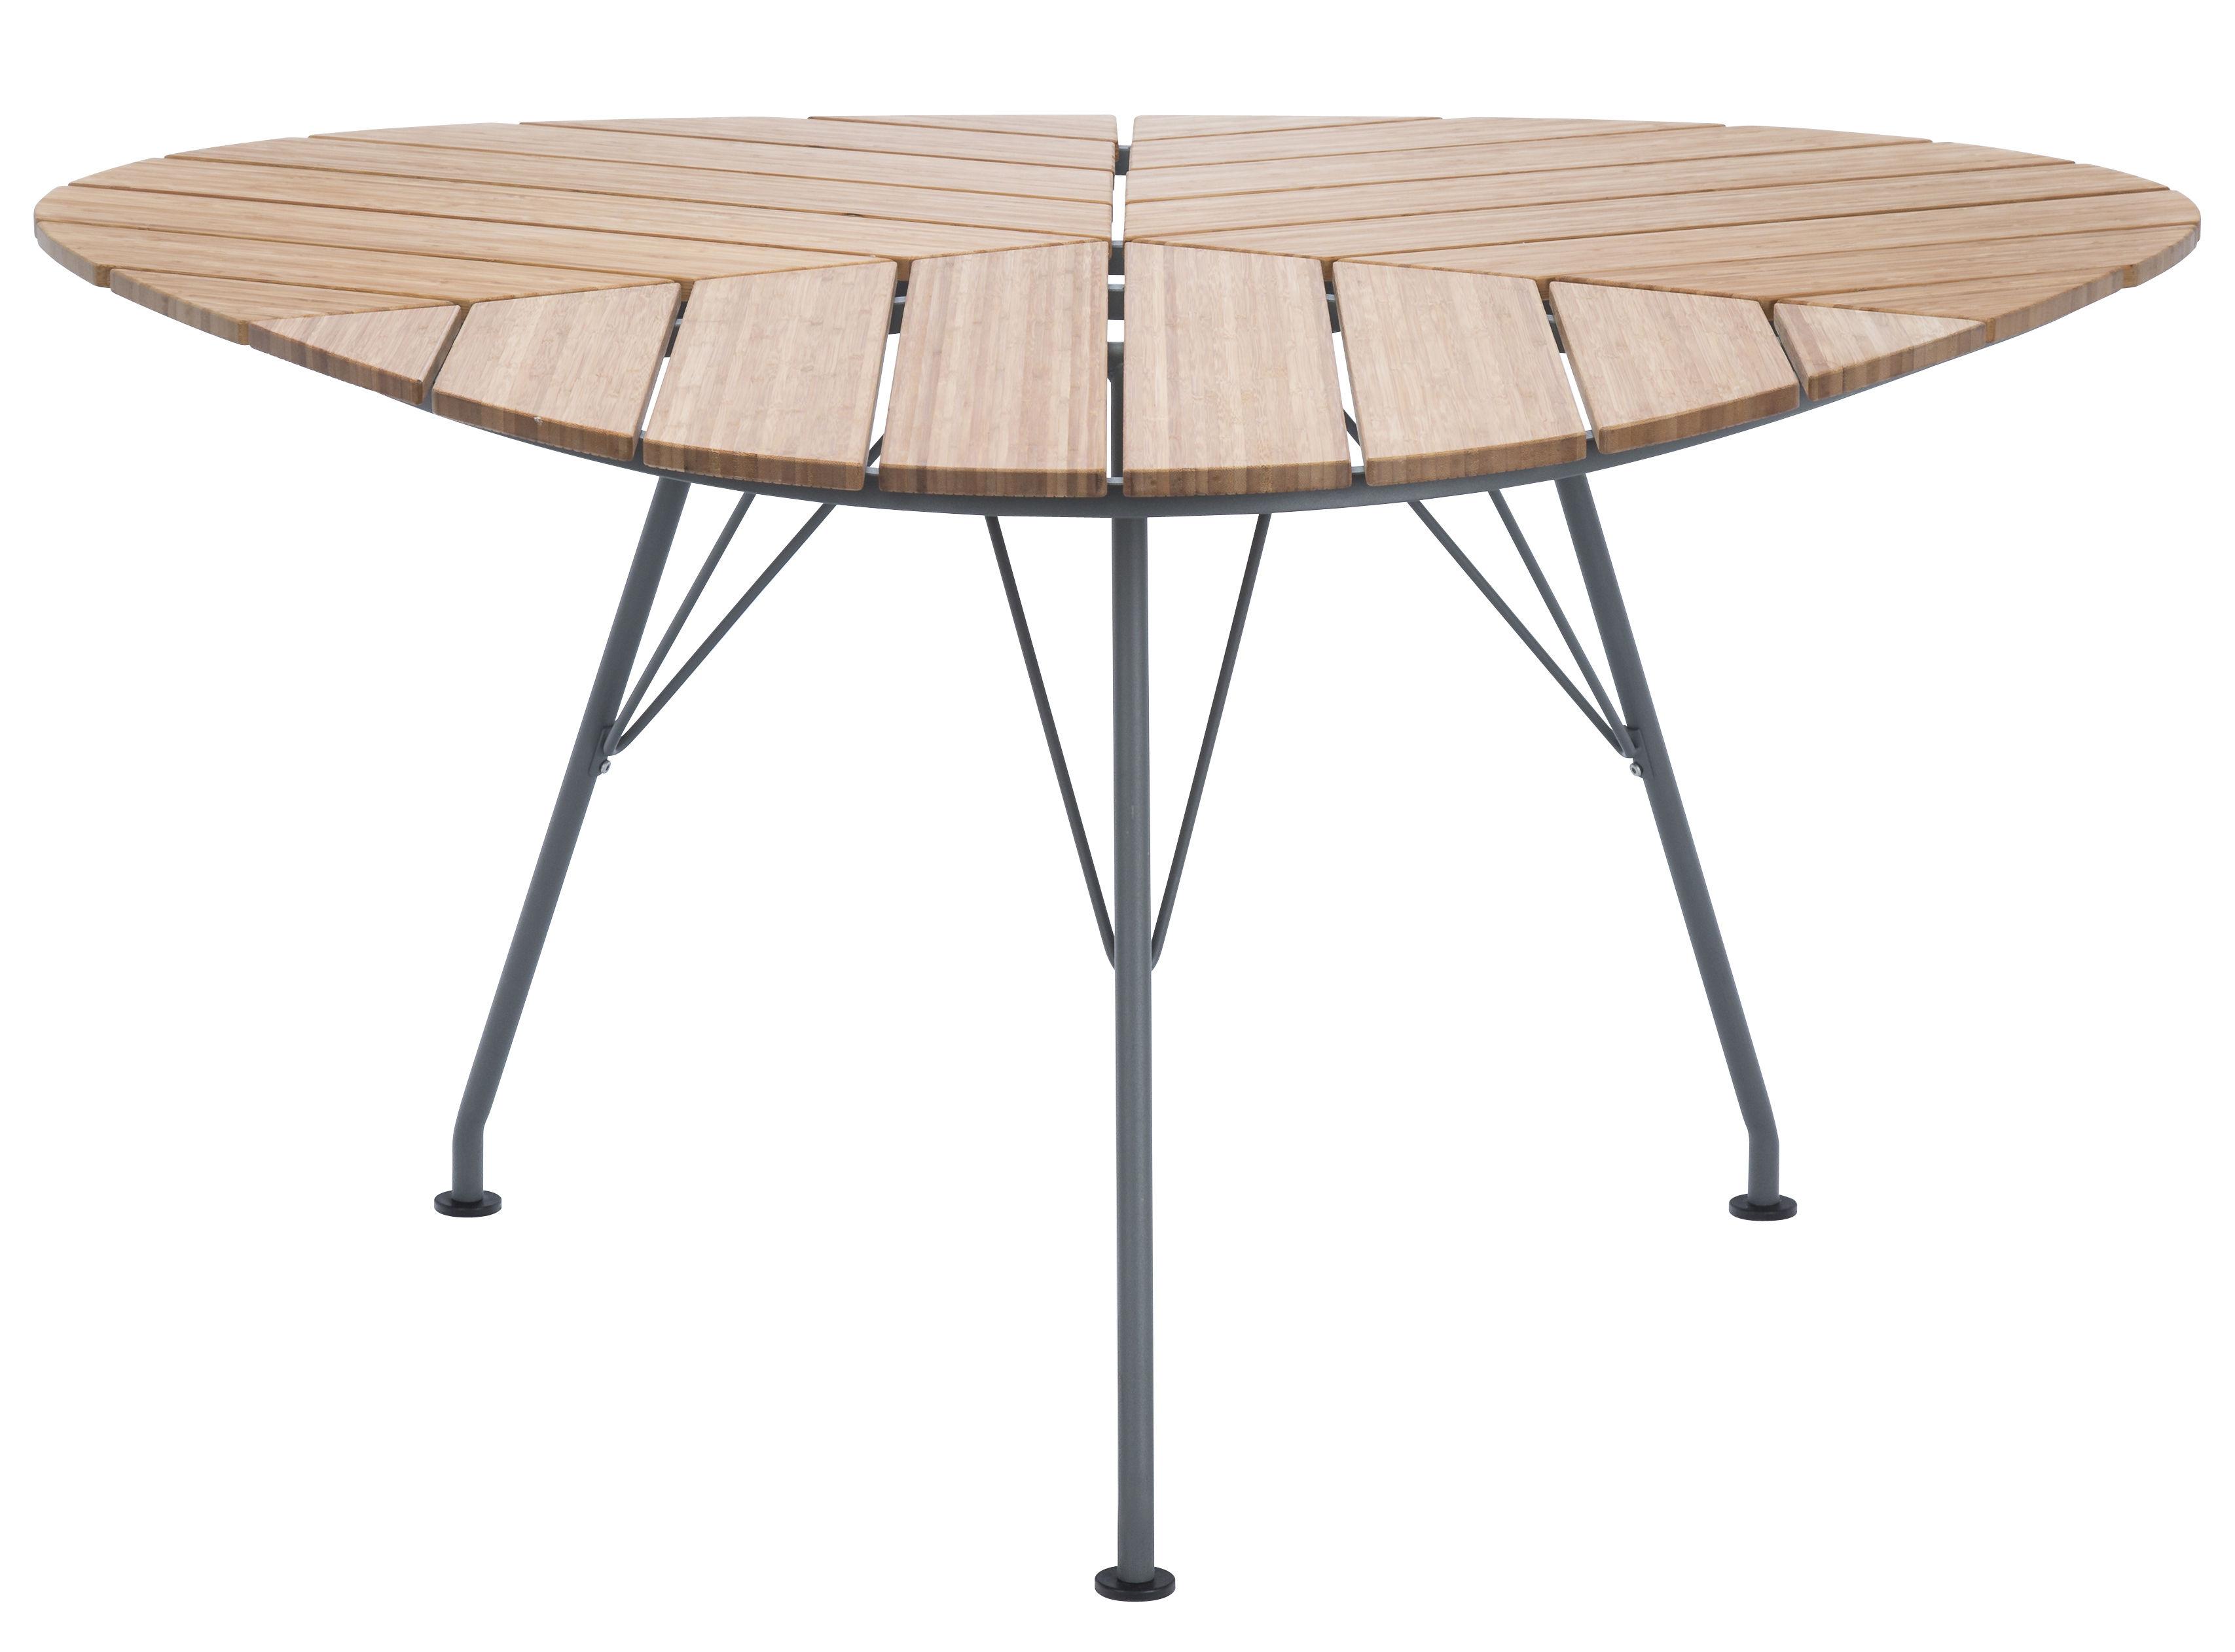 Outdoor - Tavoli  - Tavolo da giardino Leaf / bambù - Triangolare - 146 x 146 x 146 cm - Houe - Bambù / Base grigio - Bambù, Metallo rivestito in resina epossidica